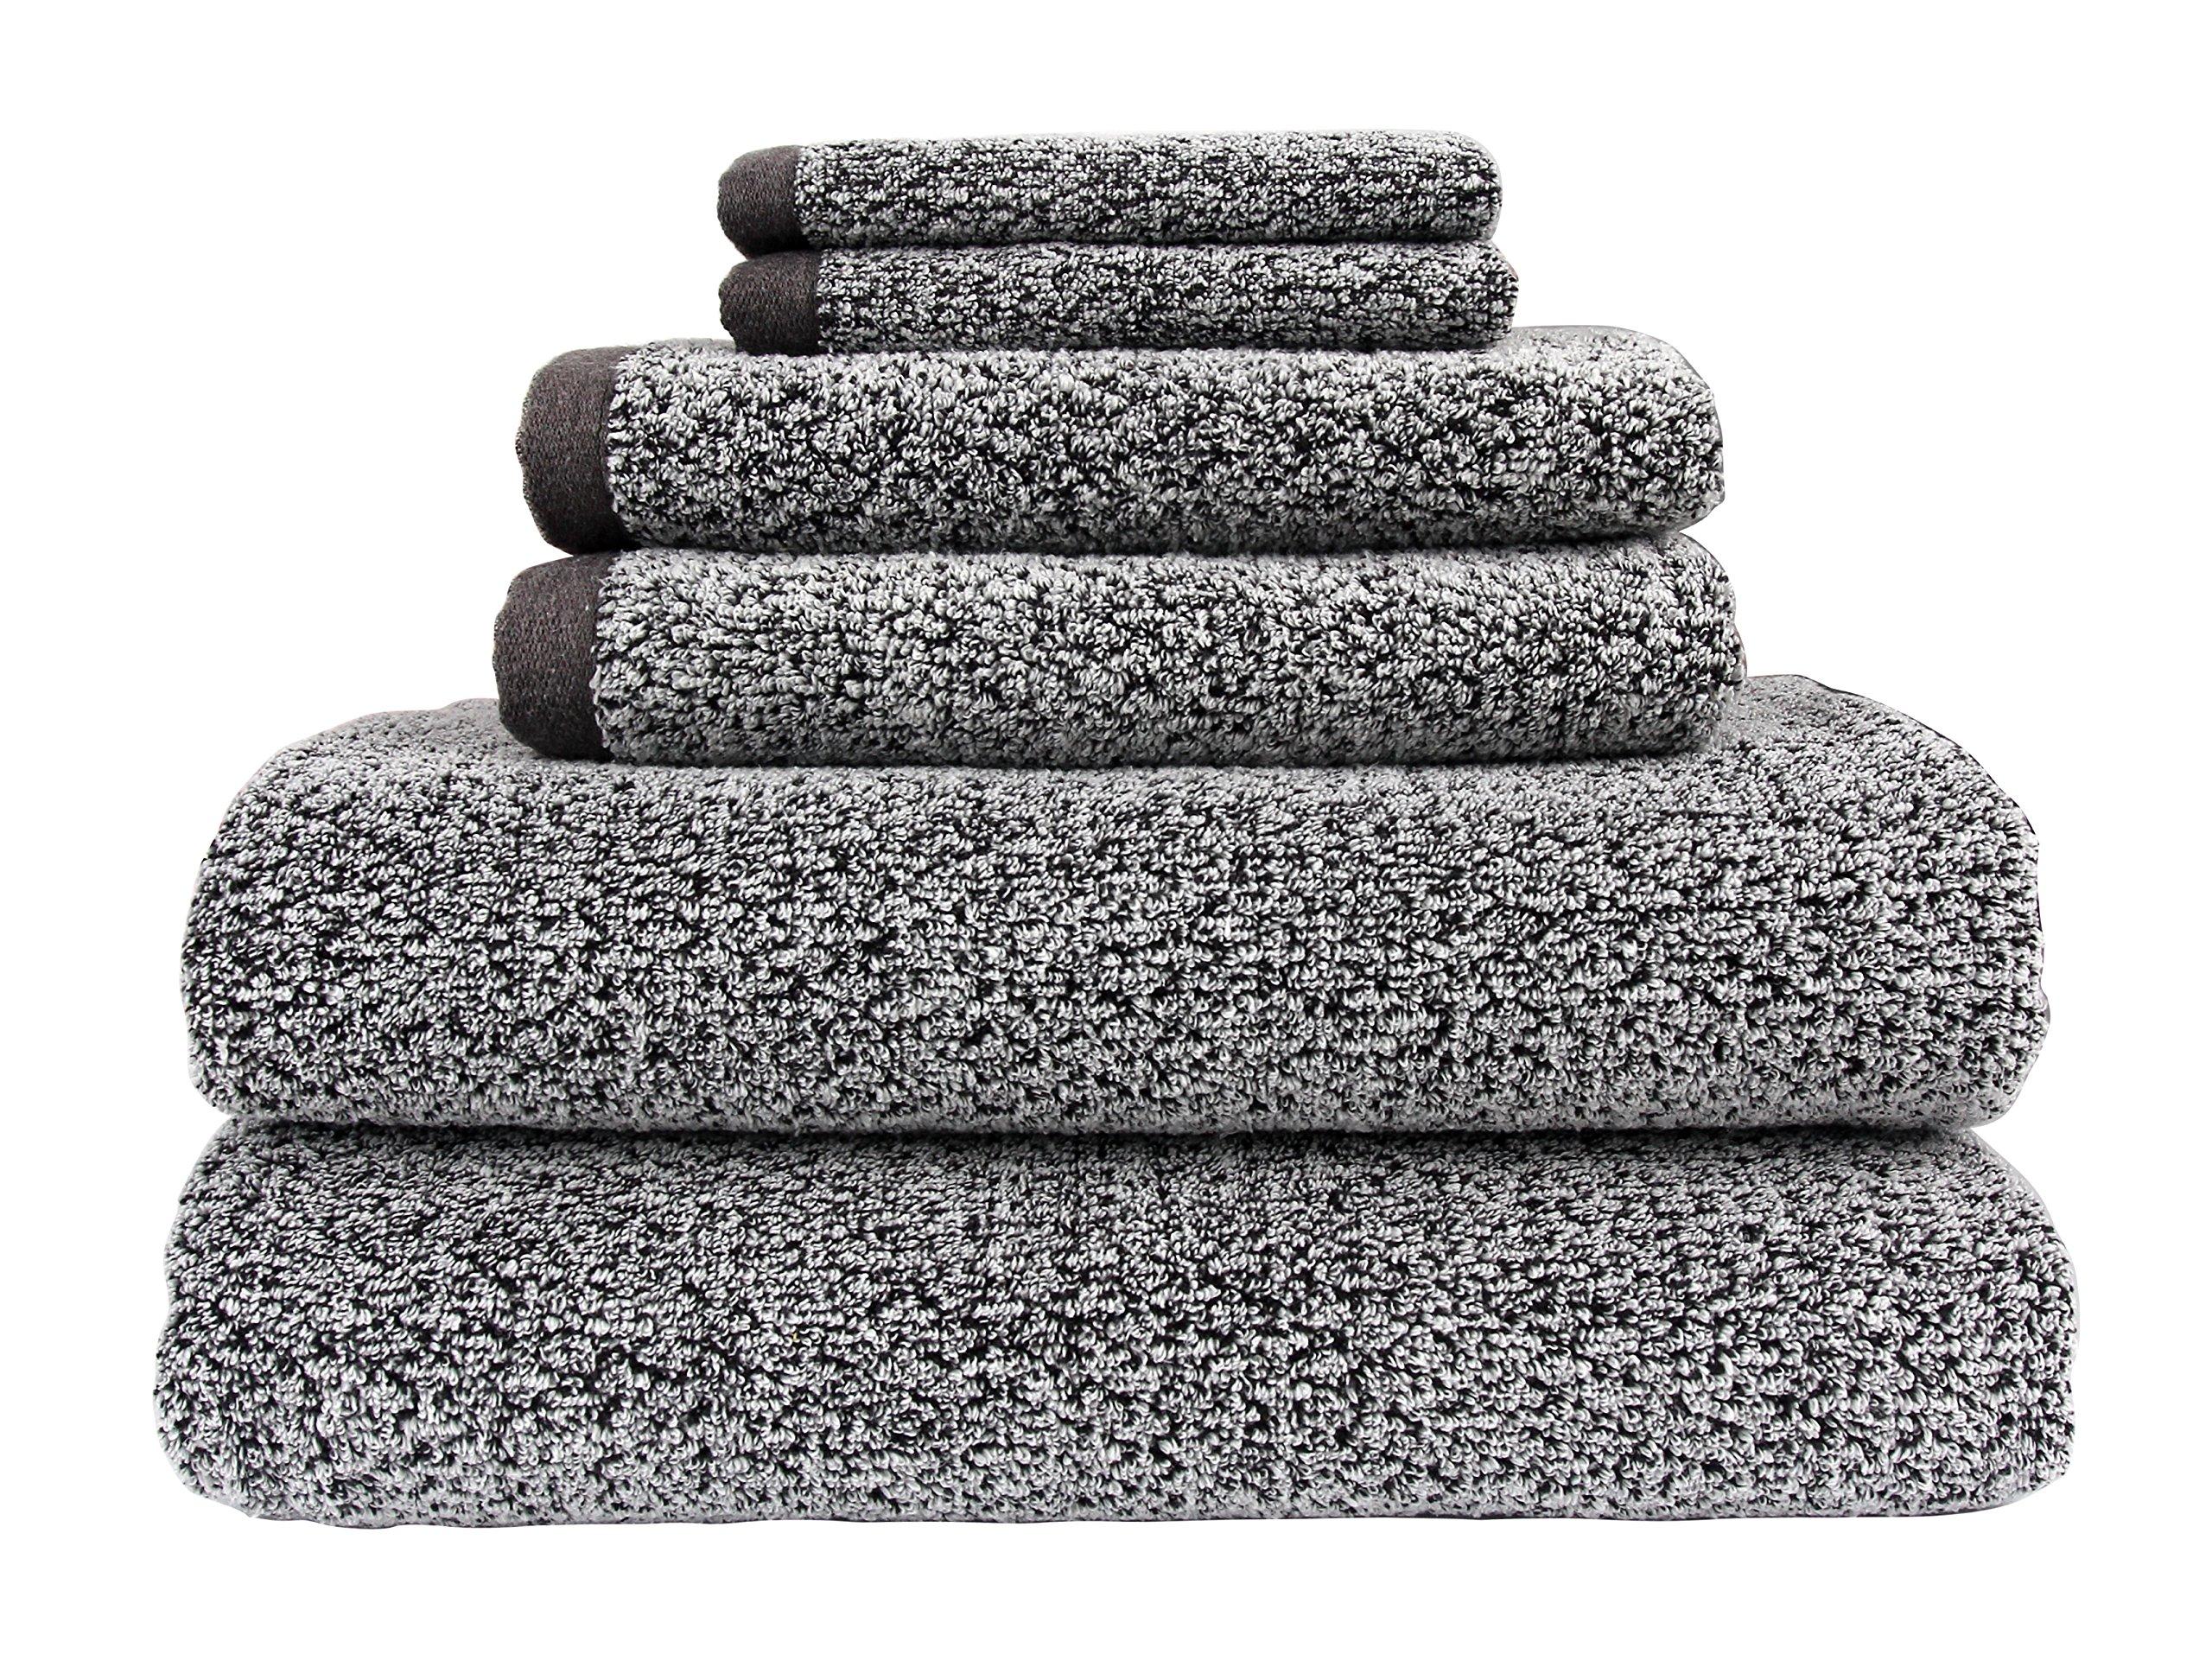 Everplush Diamond Jacquard Bath Towel 6 Piece Value Pack in Grey